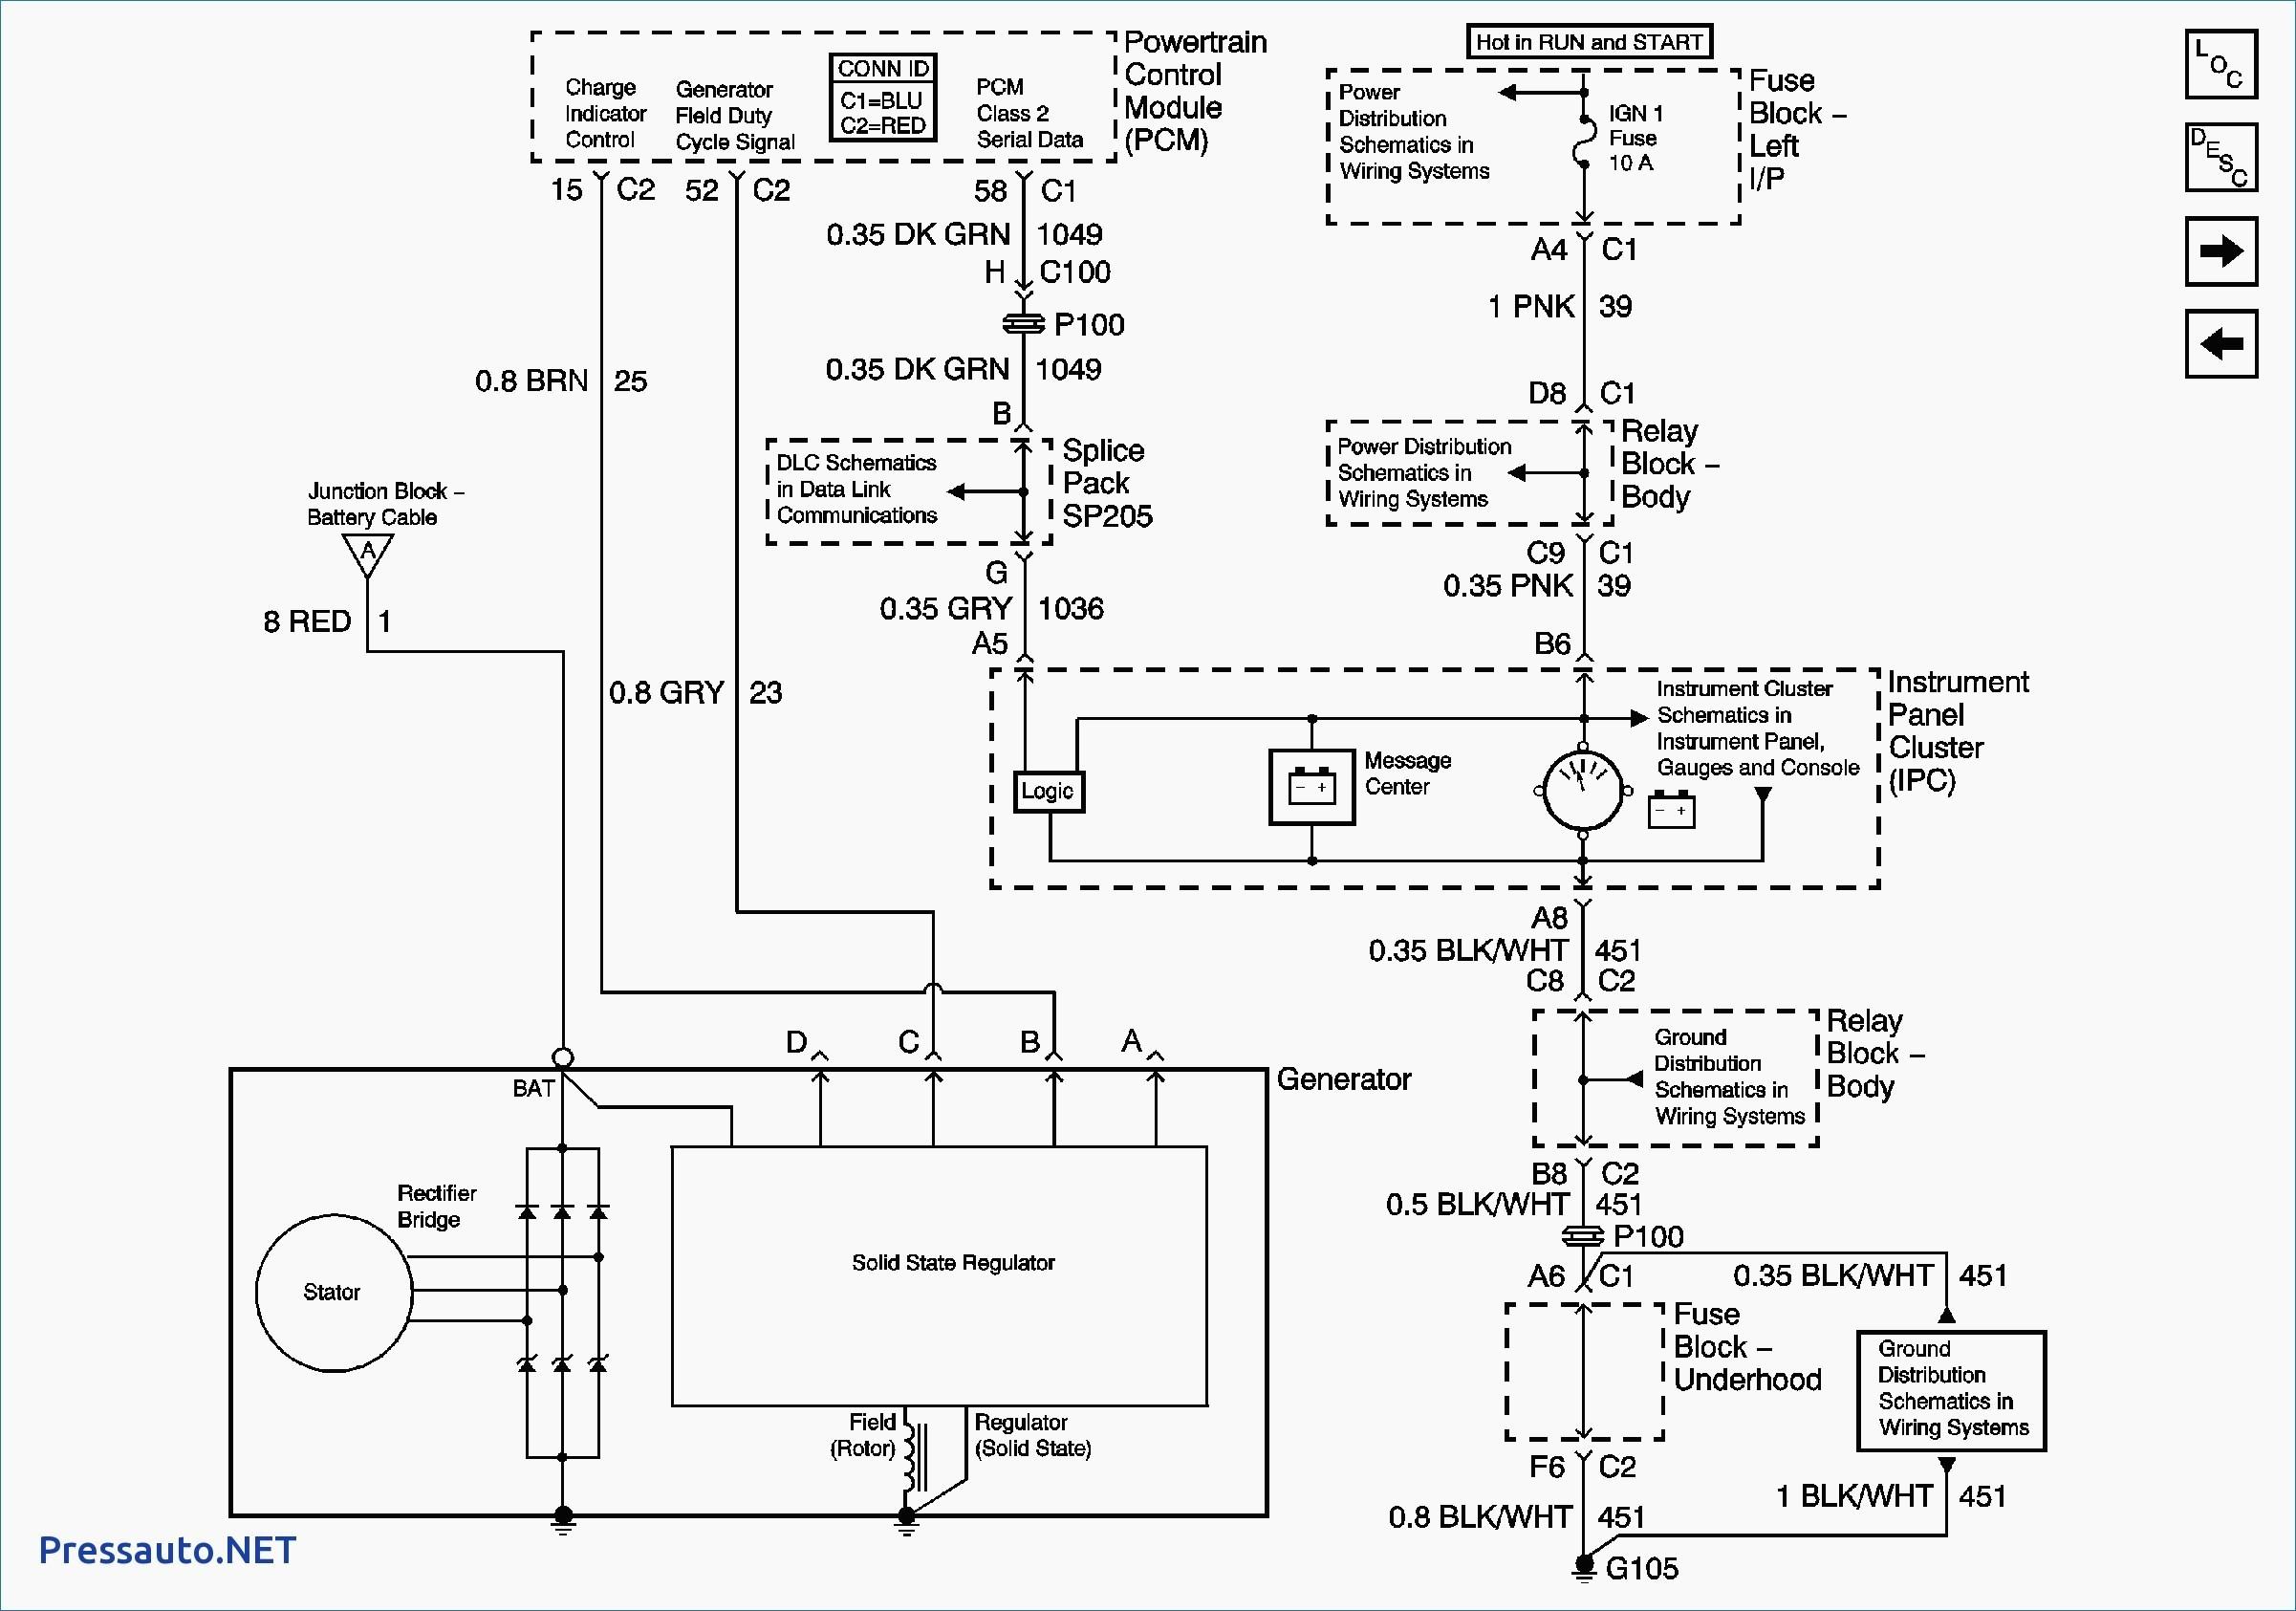 02 Tracker Wiring Diagrams Gm 2 Wire Alternator Wiring Diagram Of 02 Tracker Wiring Diagrams